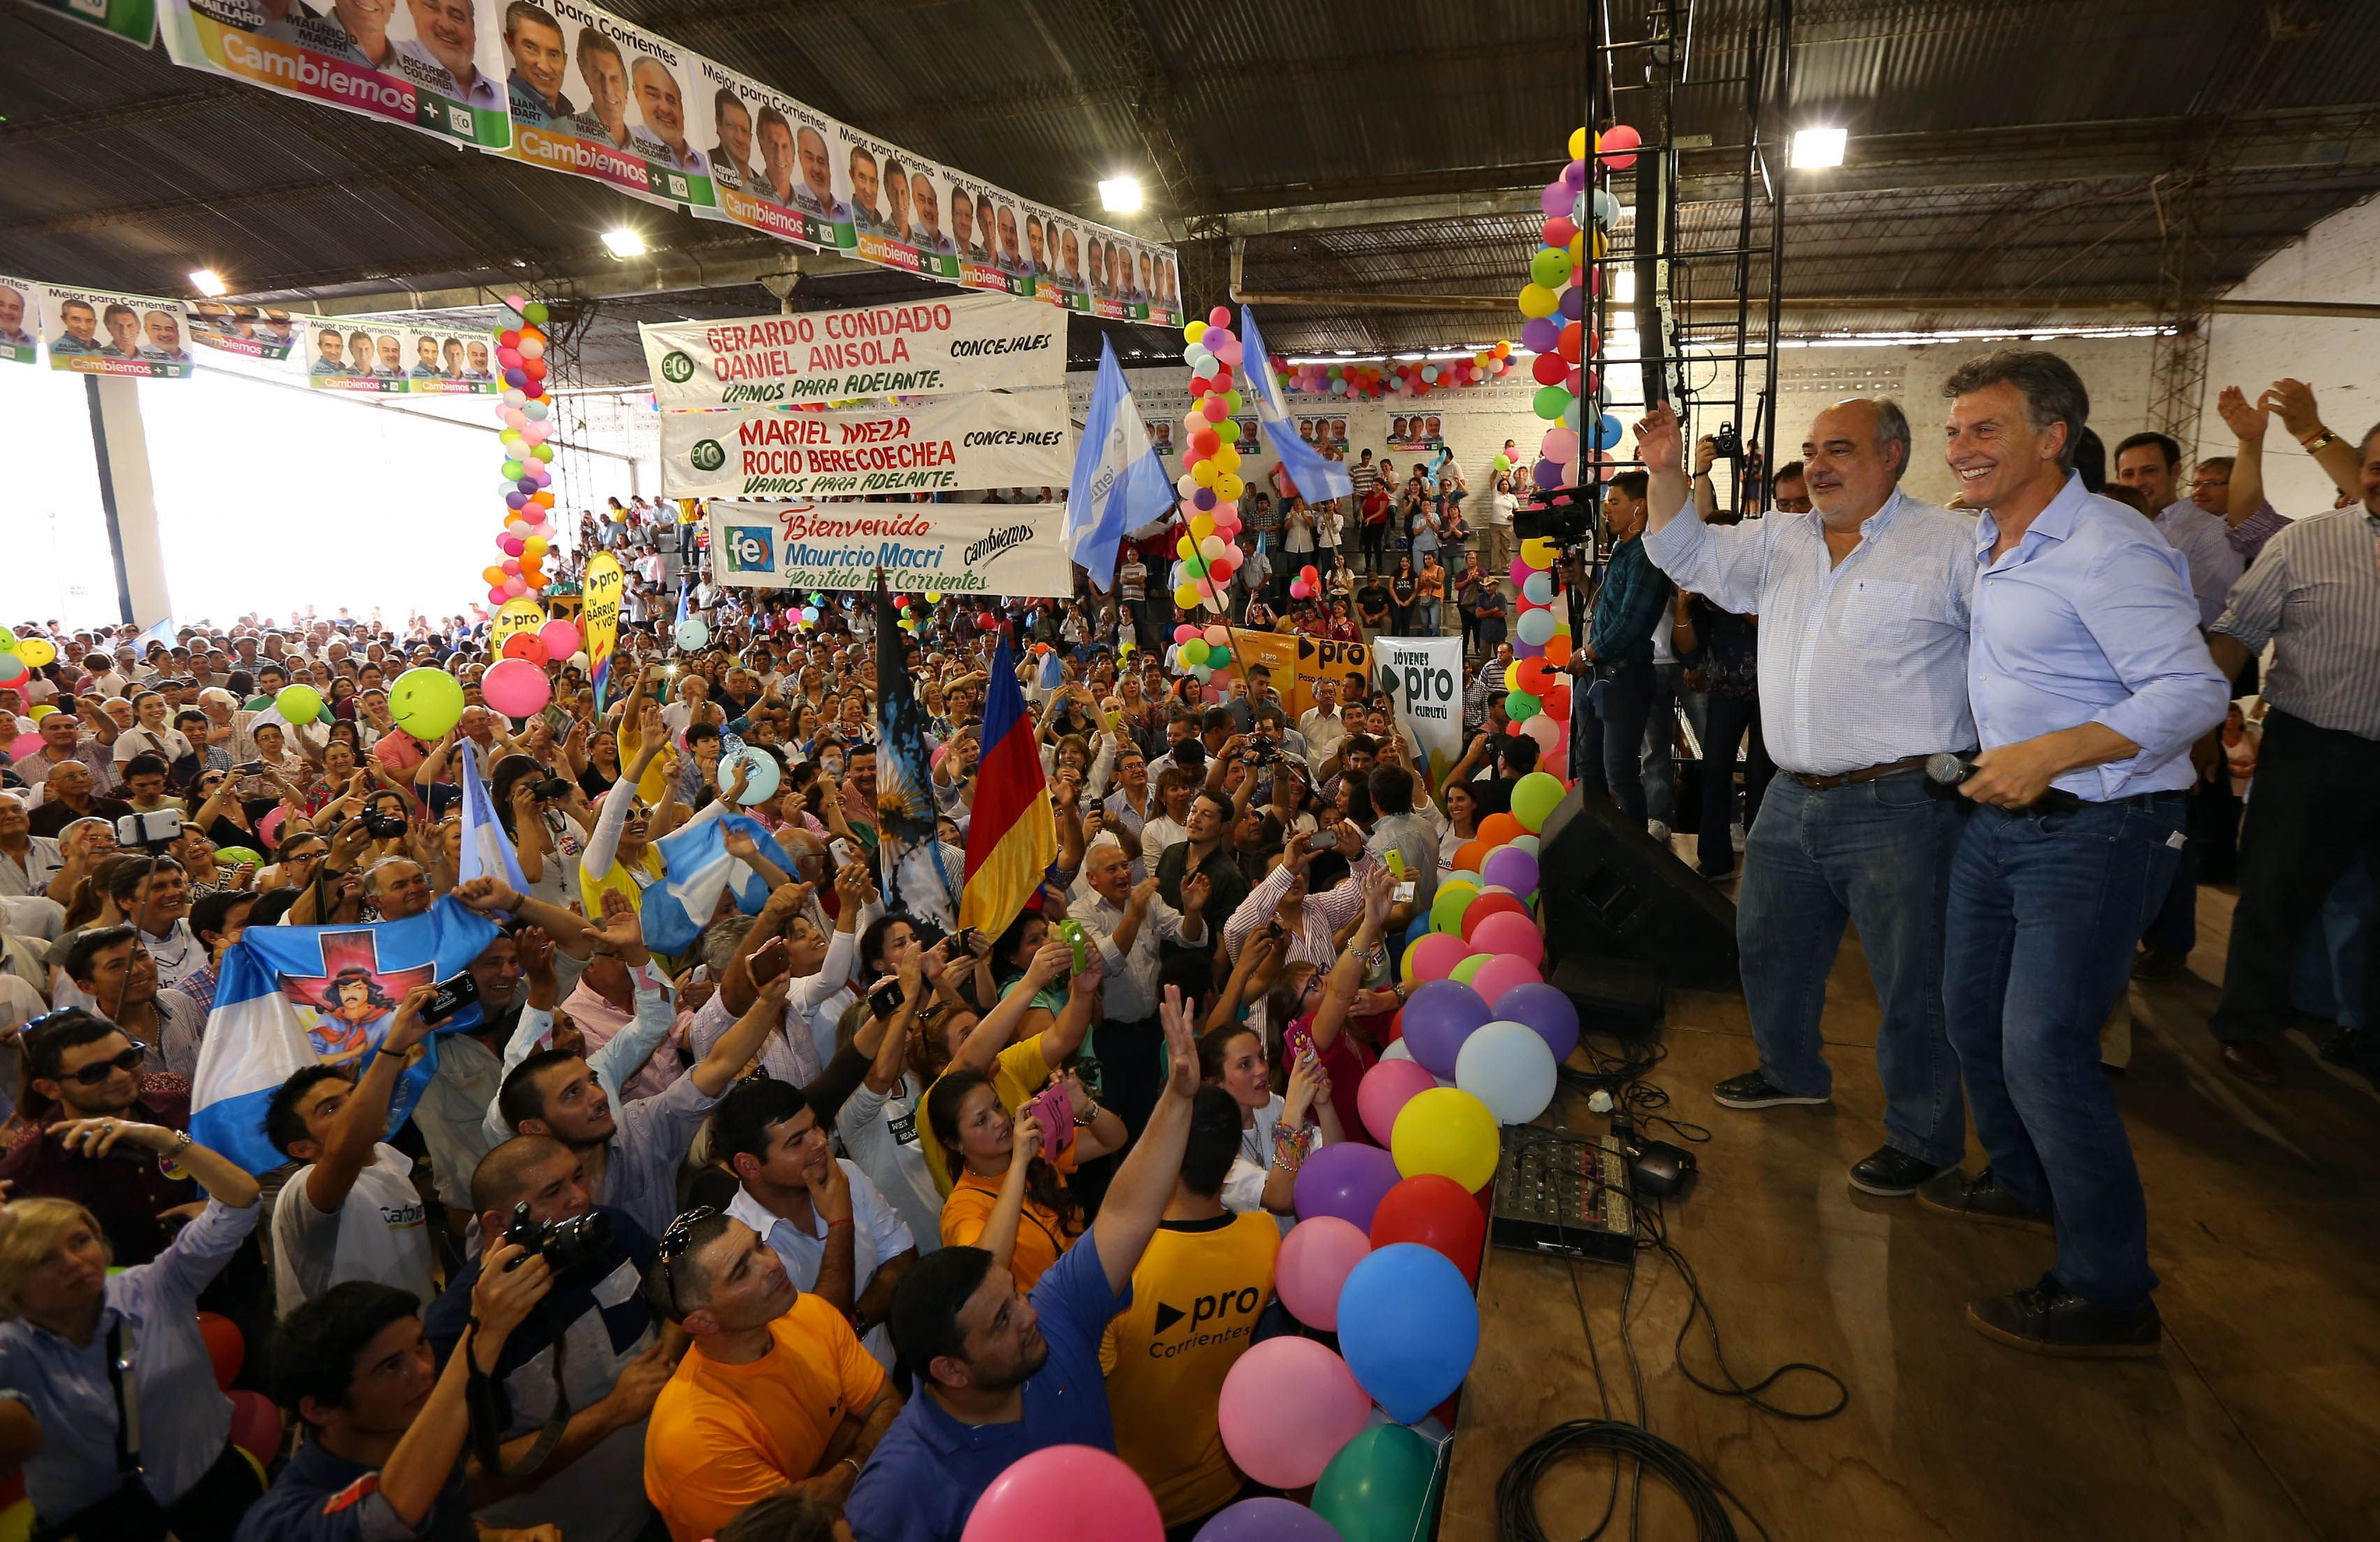 Gobernador que apoyó a Macri reclama el 15% de coparticipación